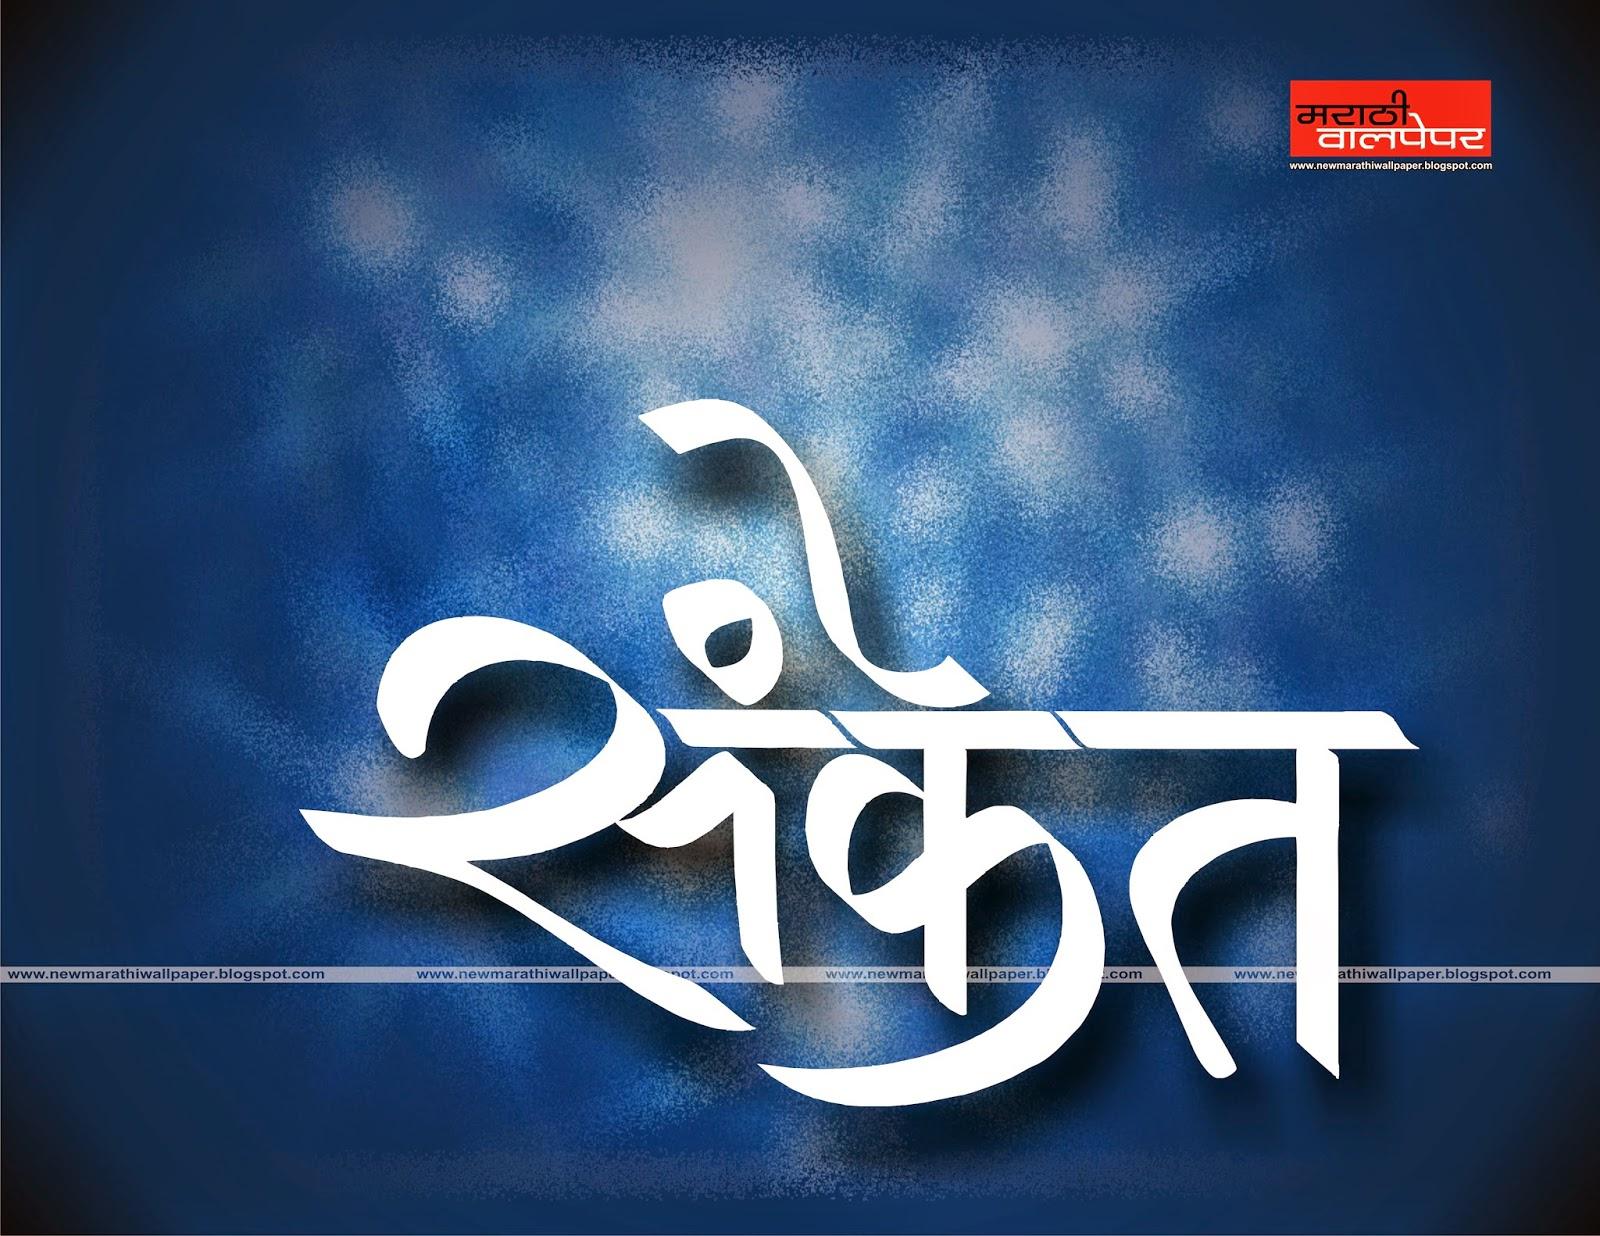 New Marathi Fb Image | Auto Design Tech